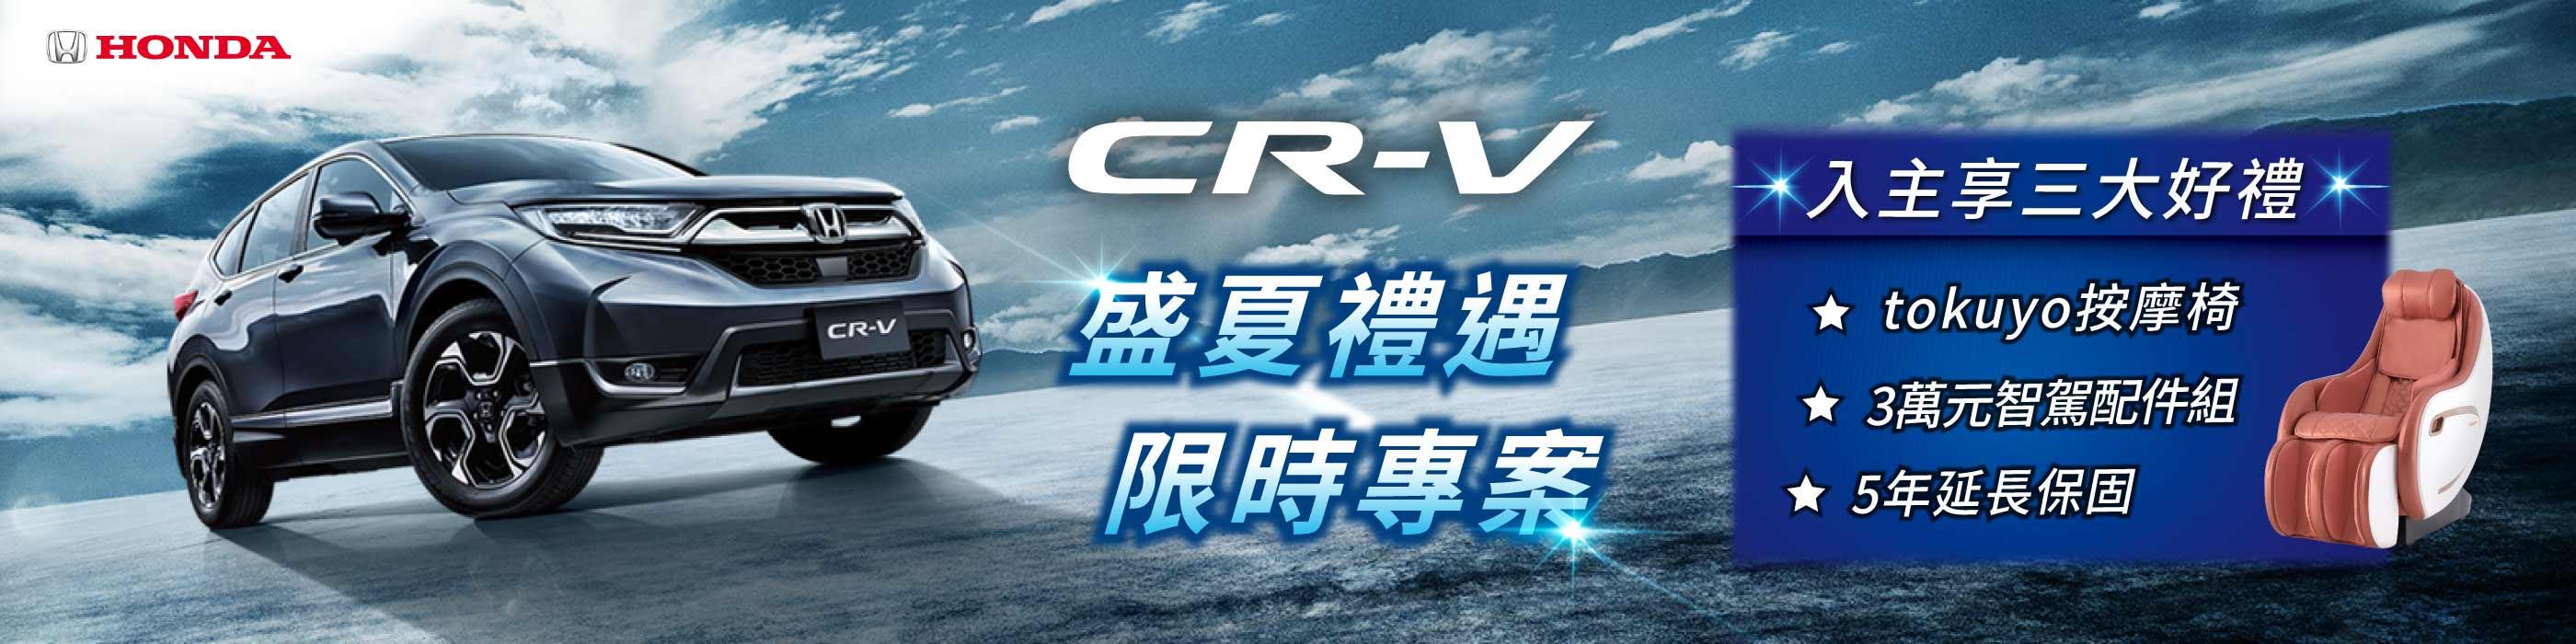 CRV.jpg